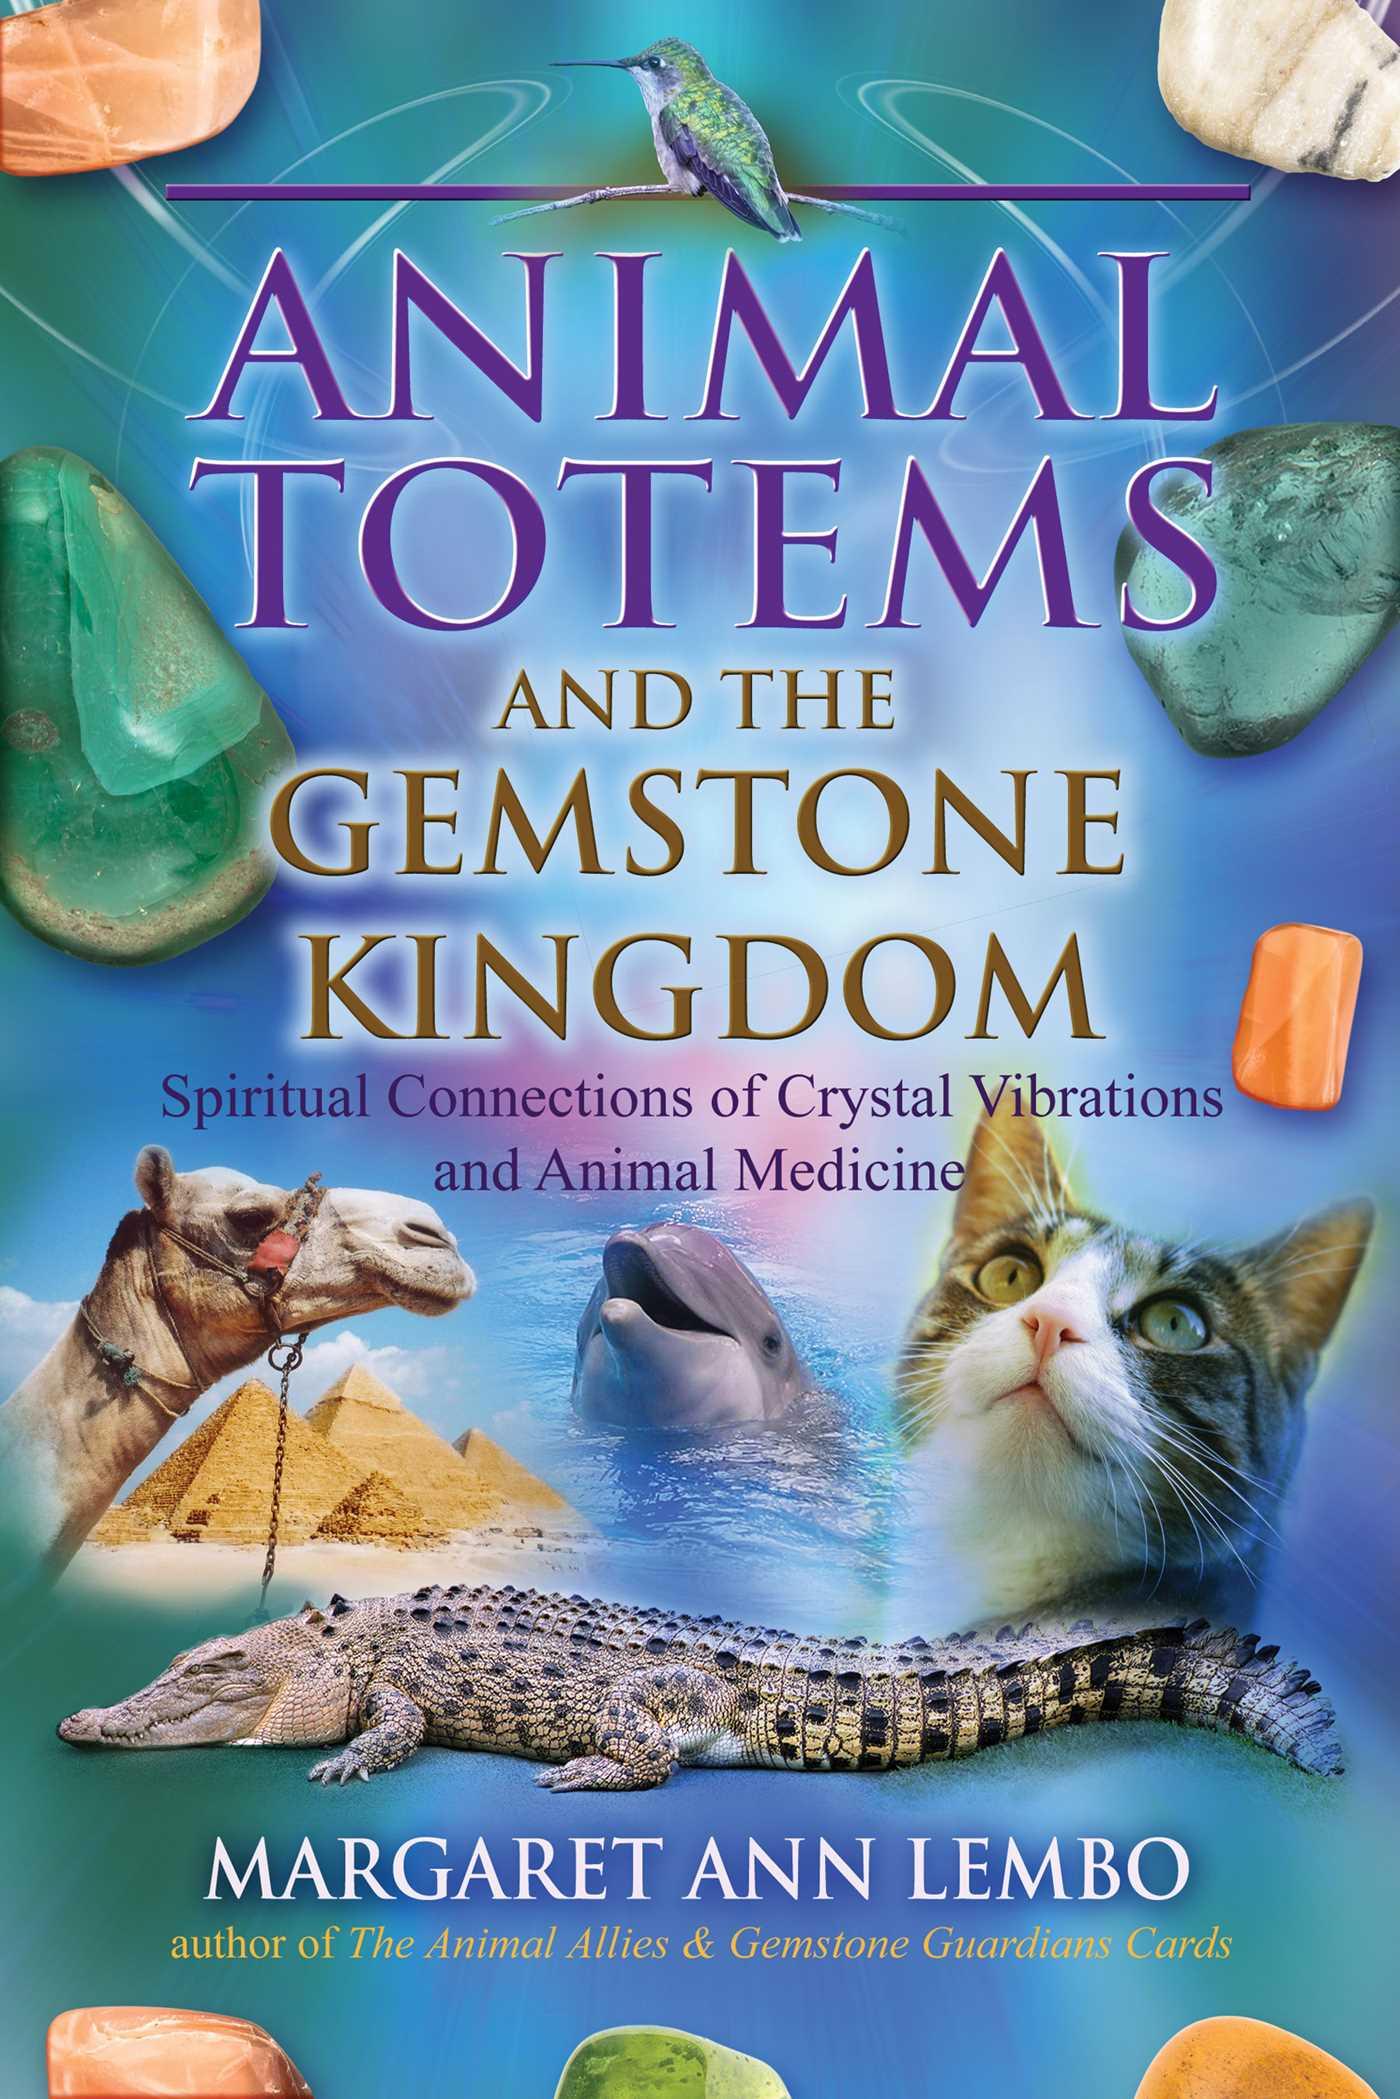 Animal totems and the gemstone kingdom 9781844097623 hr